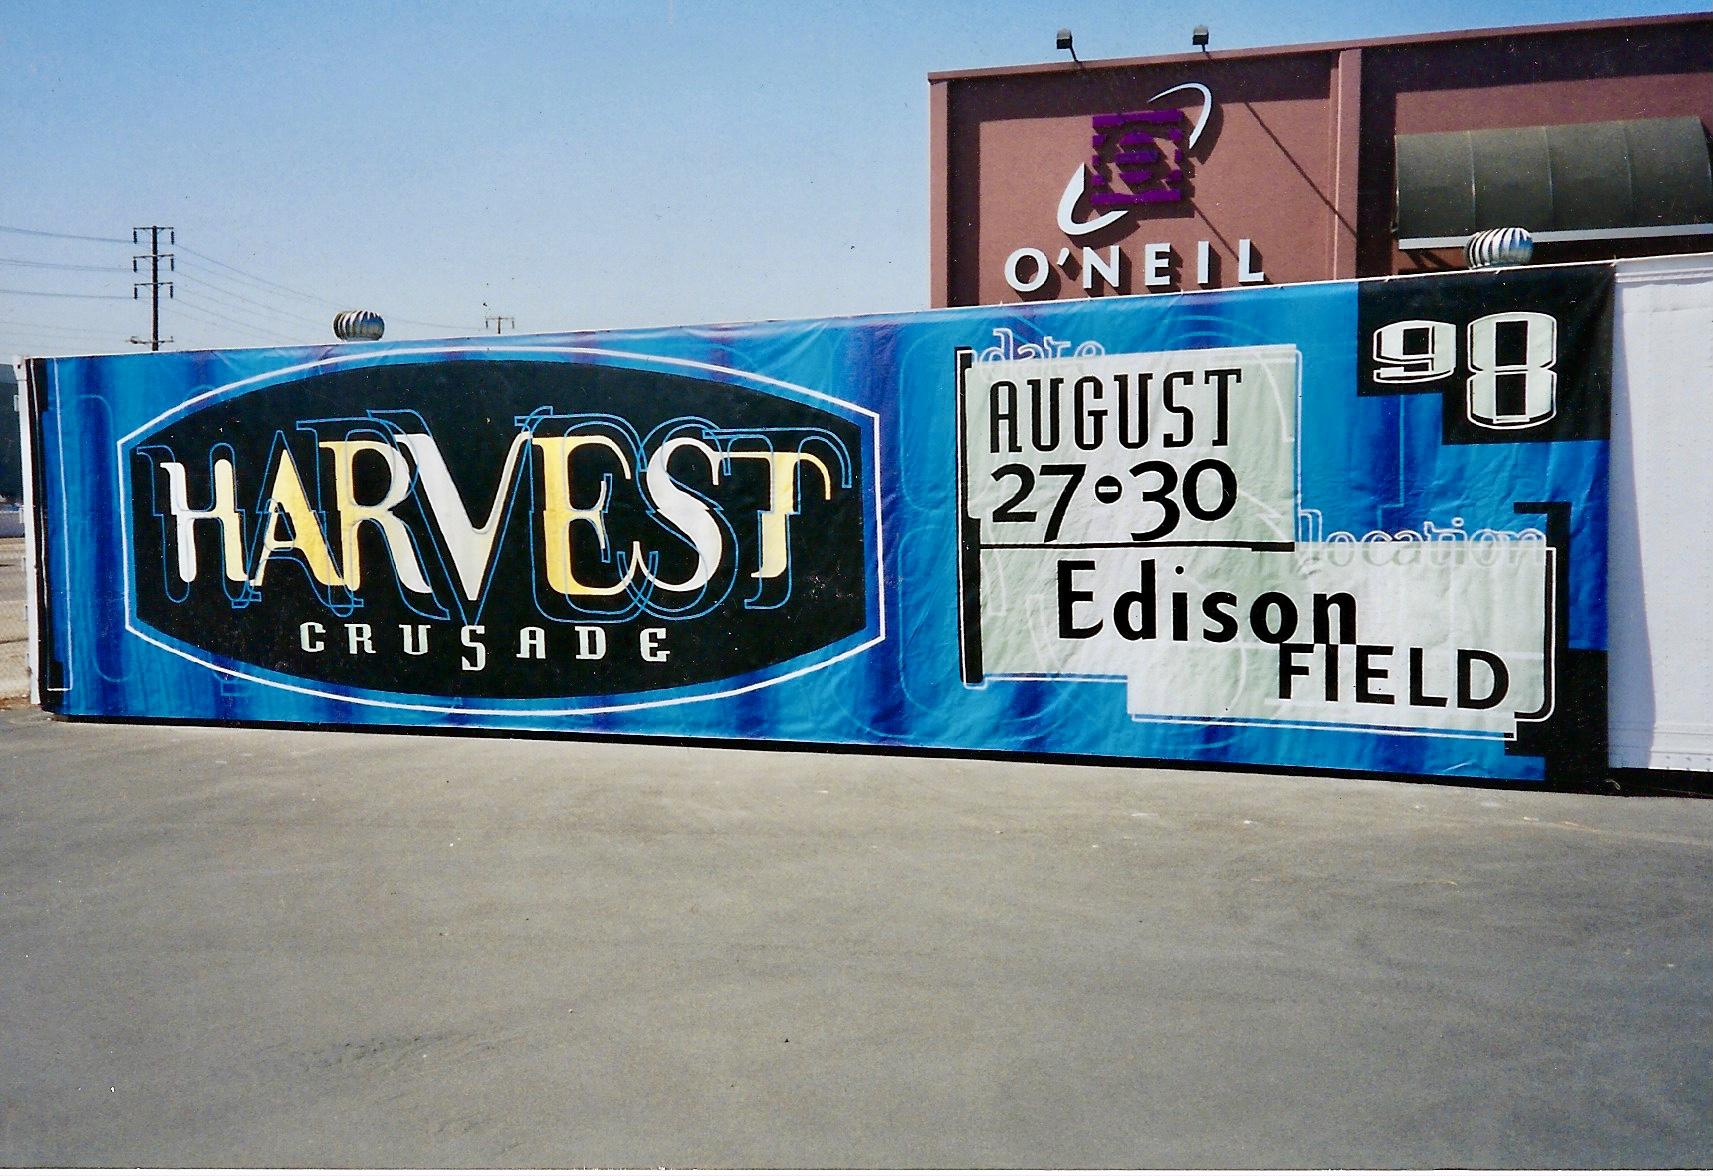 Harvest Crusade freeway custom advertising banner 1998 - hand painted banner